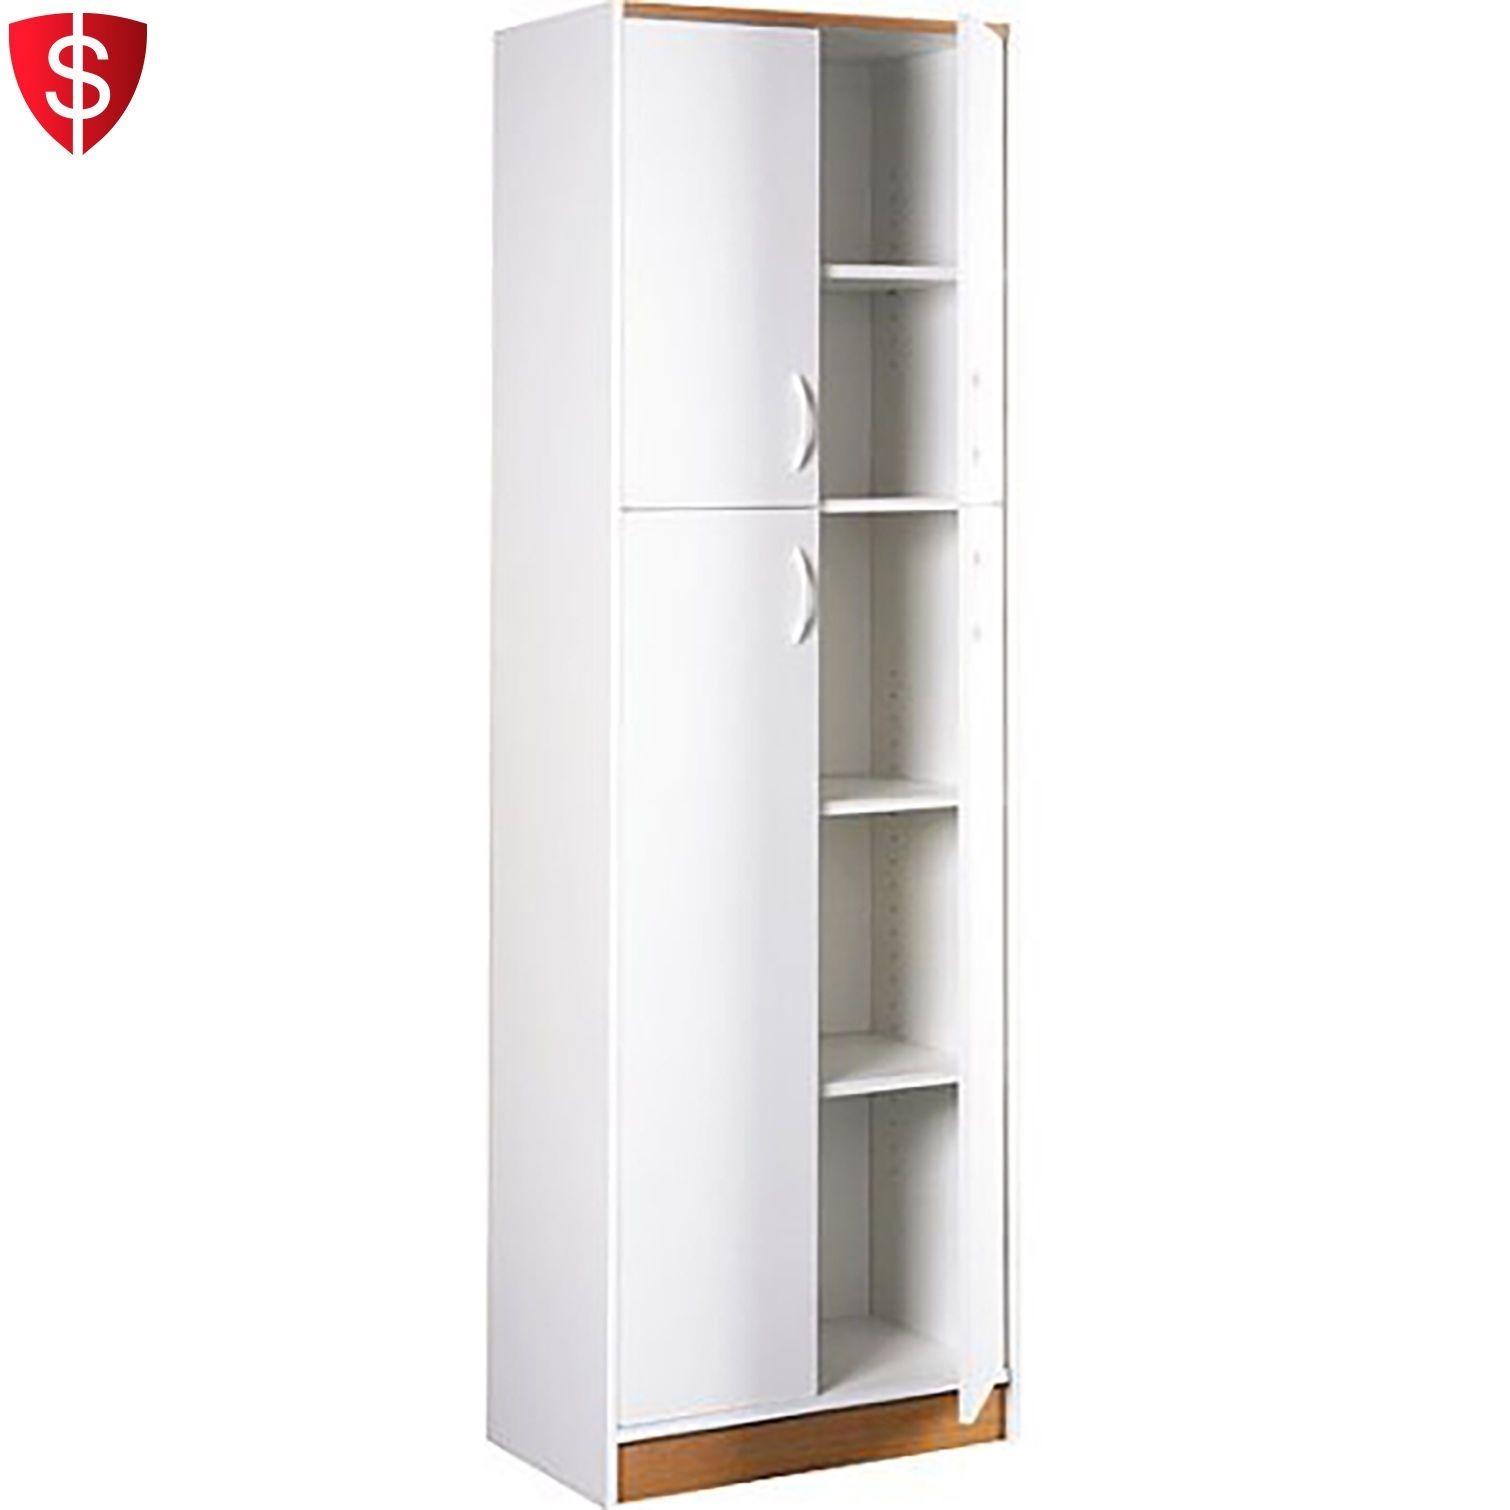 Kitchen Pantry Storage Cabinet 5 Shelves Organizer Shelf Utility Food 4 Doors 1